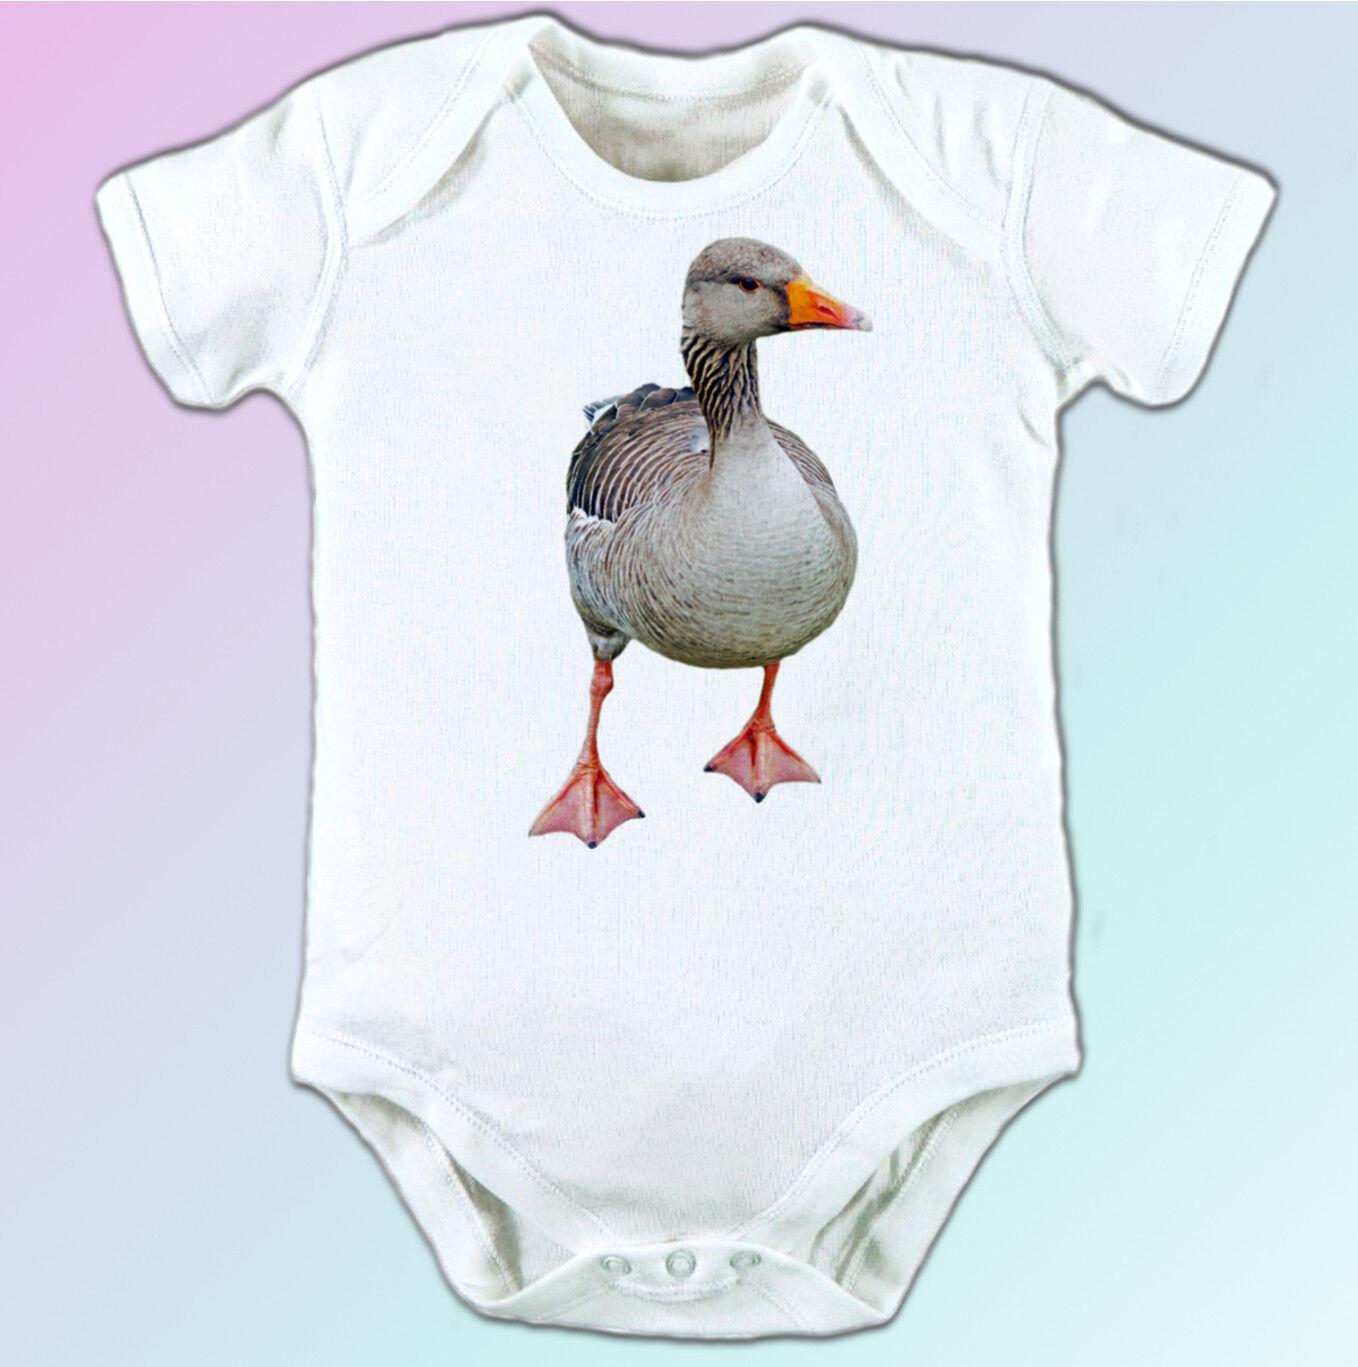 Goose Blanc T Shirt Shirt Shirt Animal Tee Top Bird Design-Homme Femme Enfants Bébé Tailles 2253f2